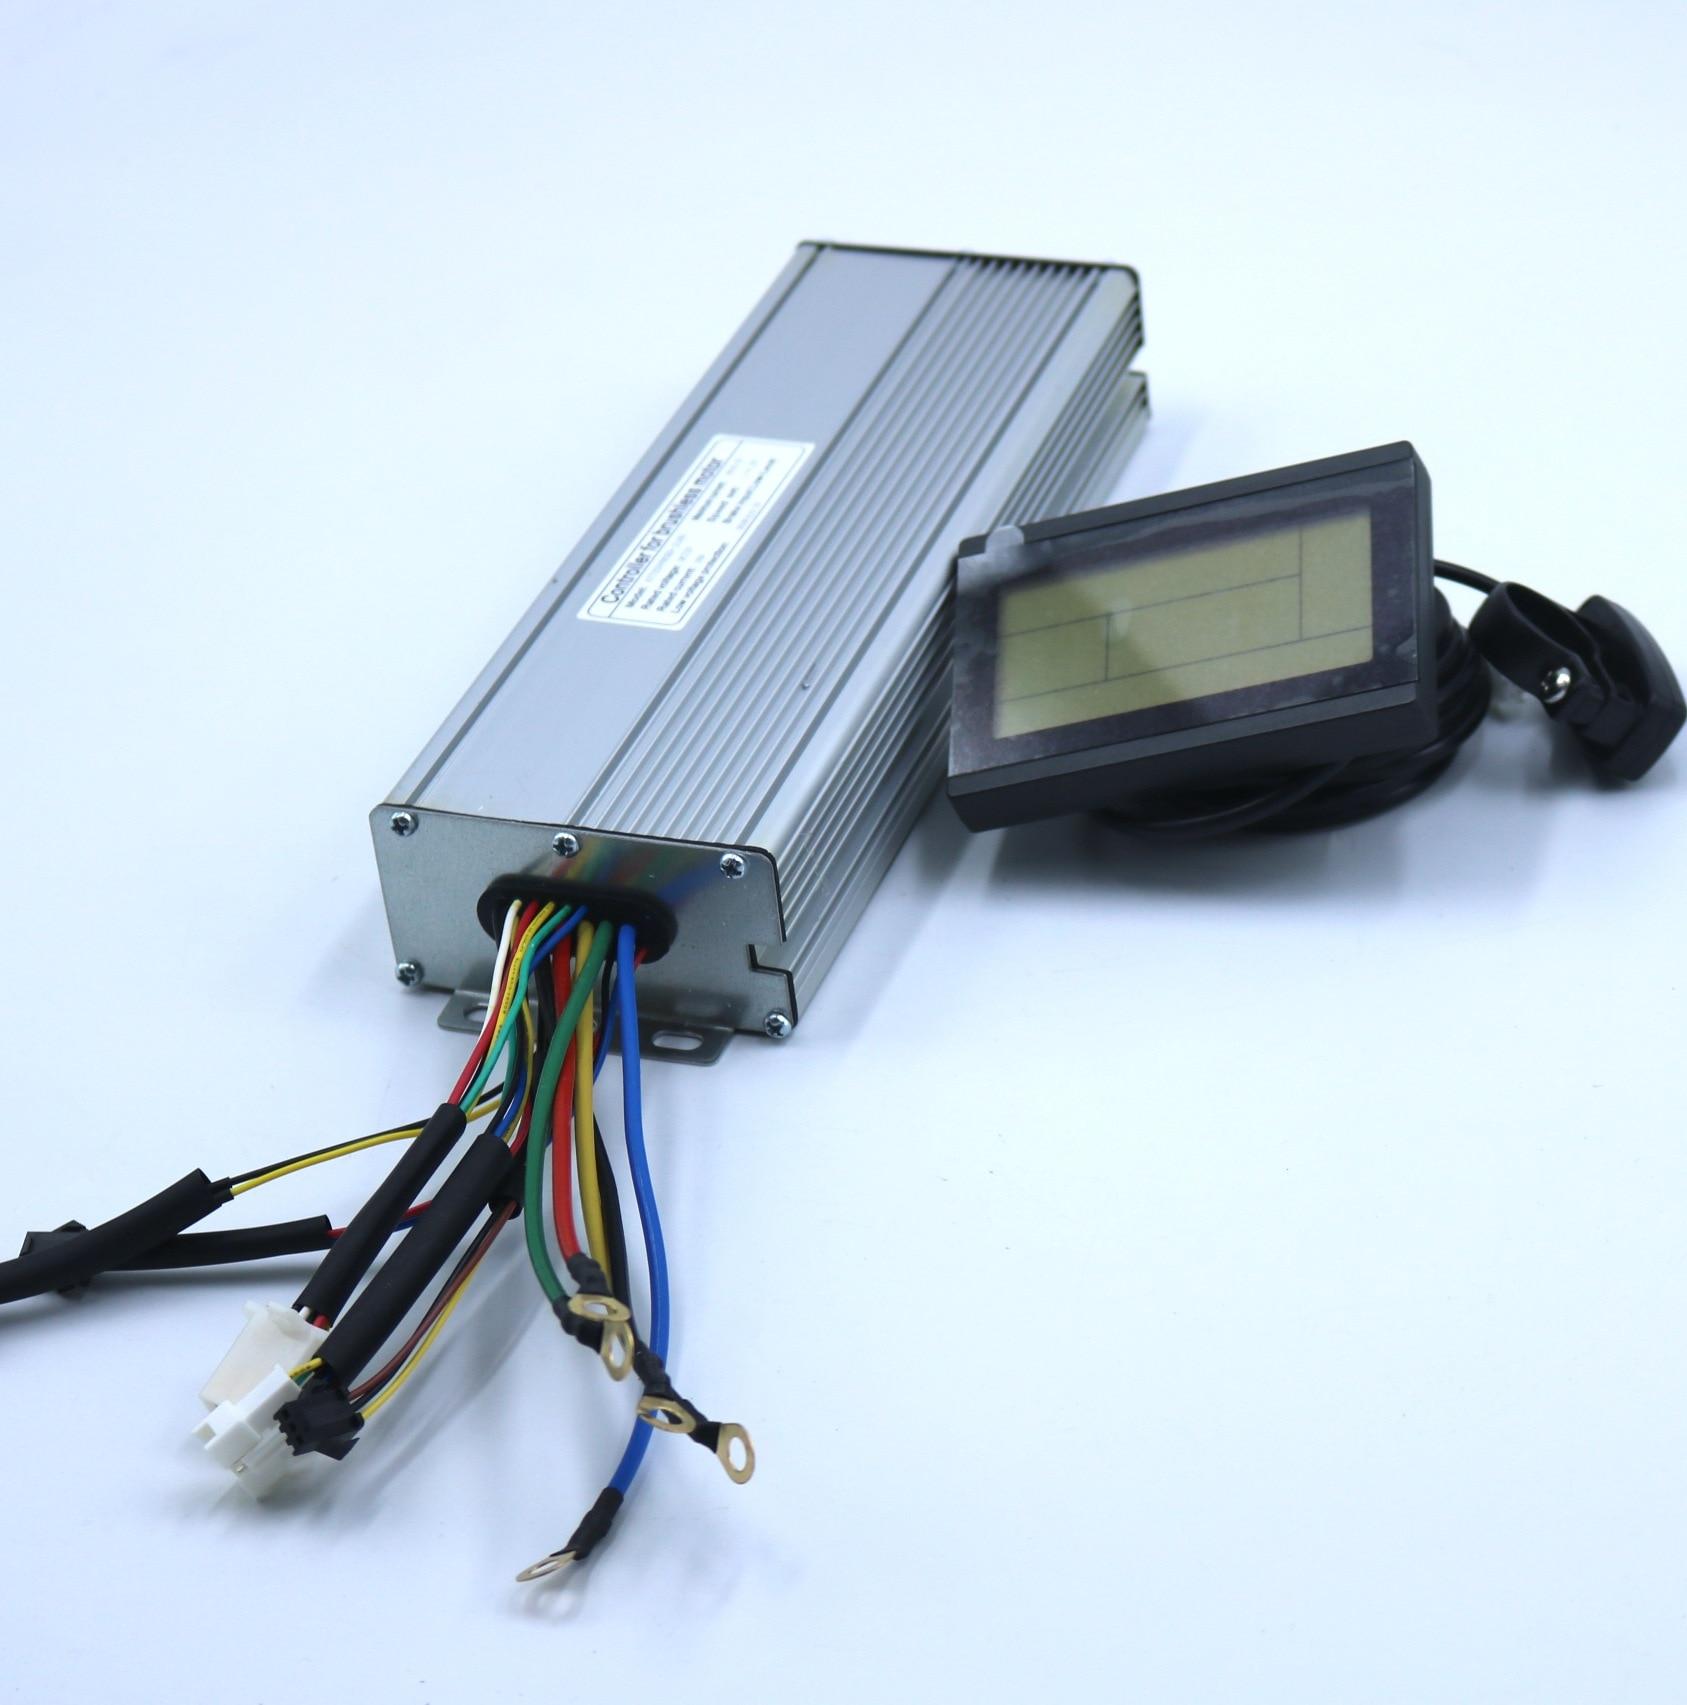 72V 2500W-3000W 60Amax Brushless DC מנוע בקר Ebike LCD3 KUNTENG סינוס גל בקר + KT-LCD3 תצוגת אחת סט